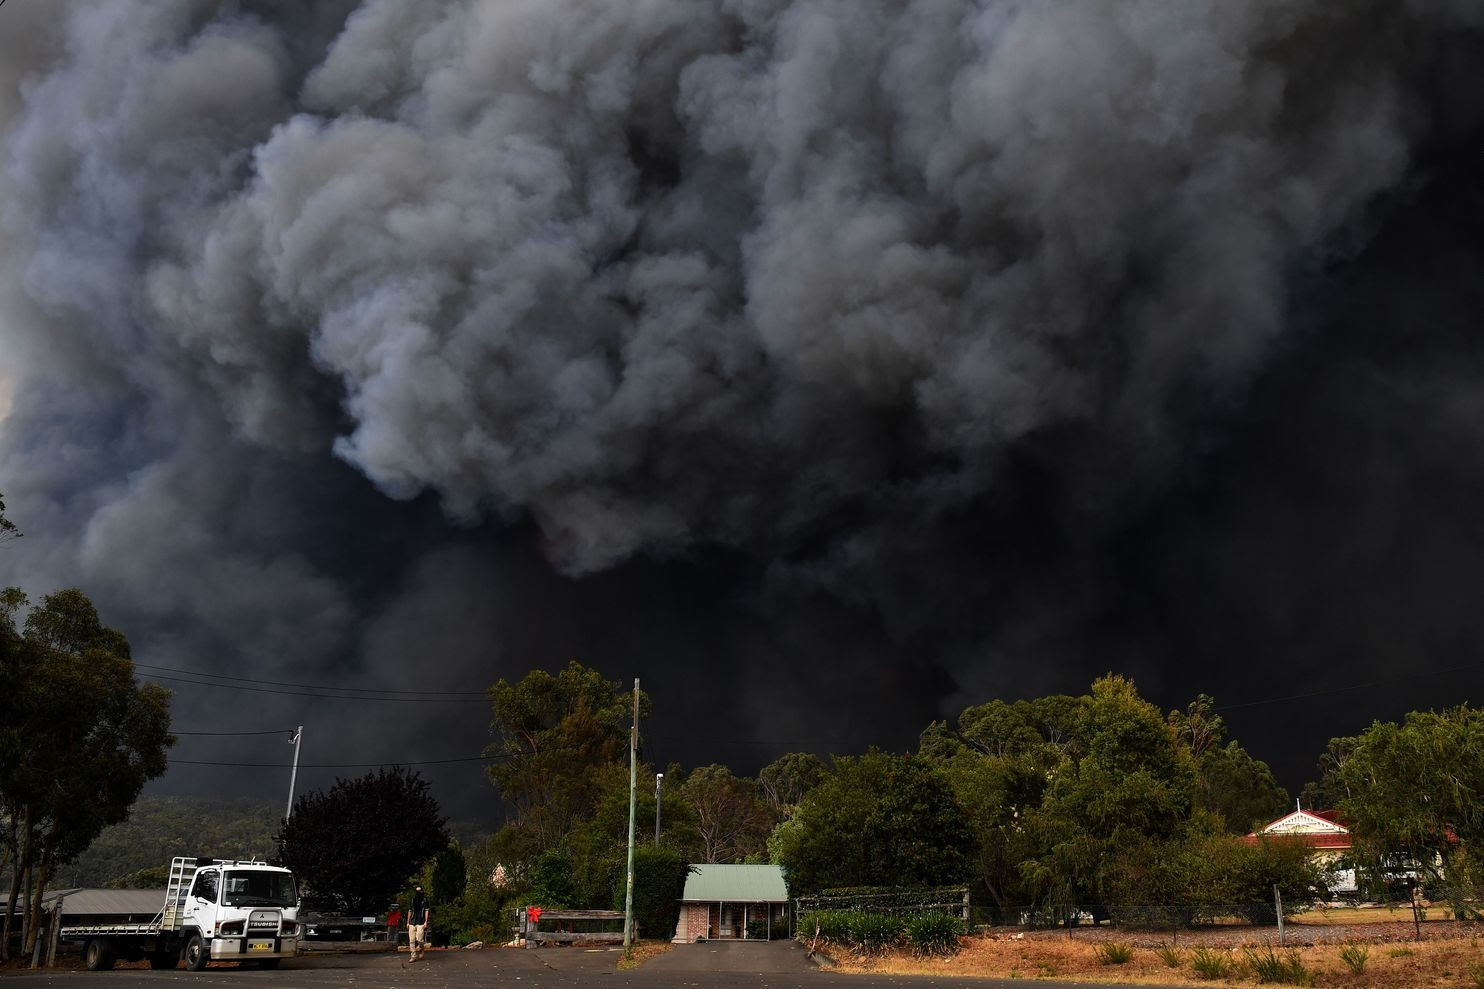 As the fires continue to burn, smoke fills the sky near Sydney, Australia.